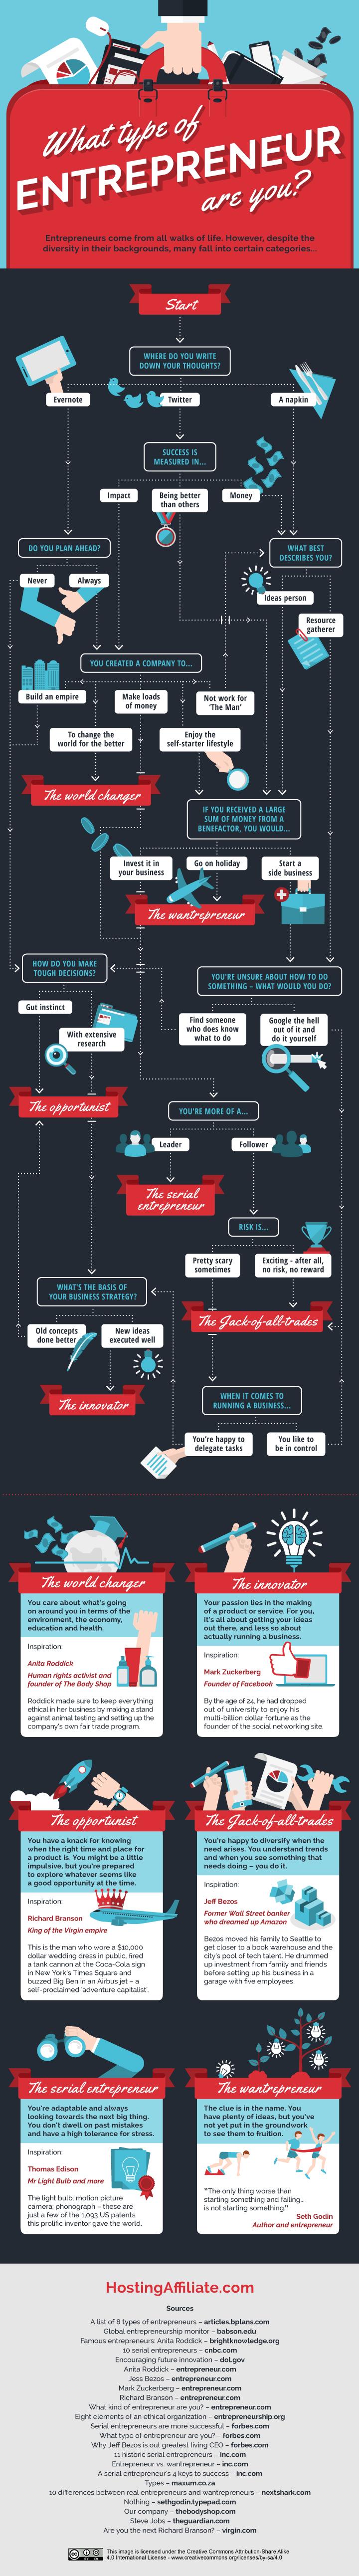 infografia-tipos-emprendedores